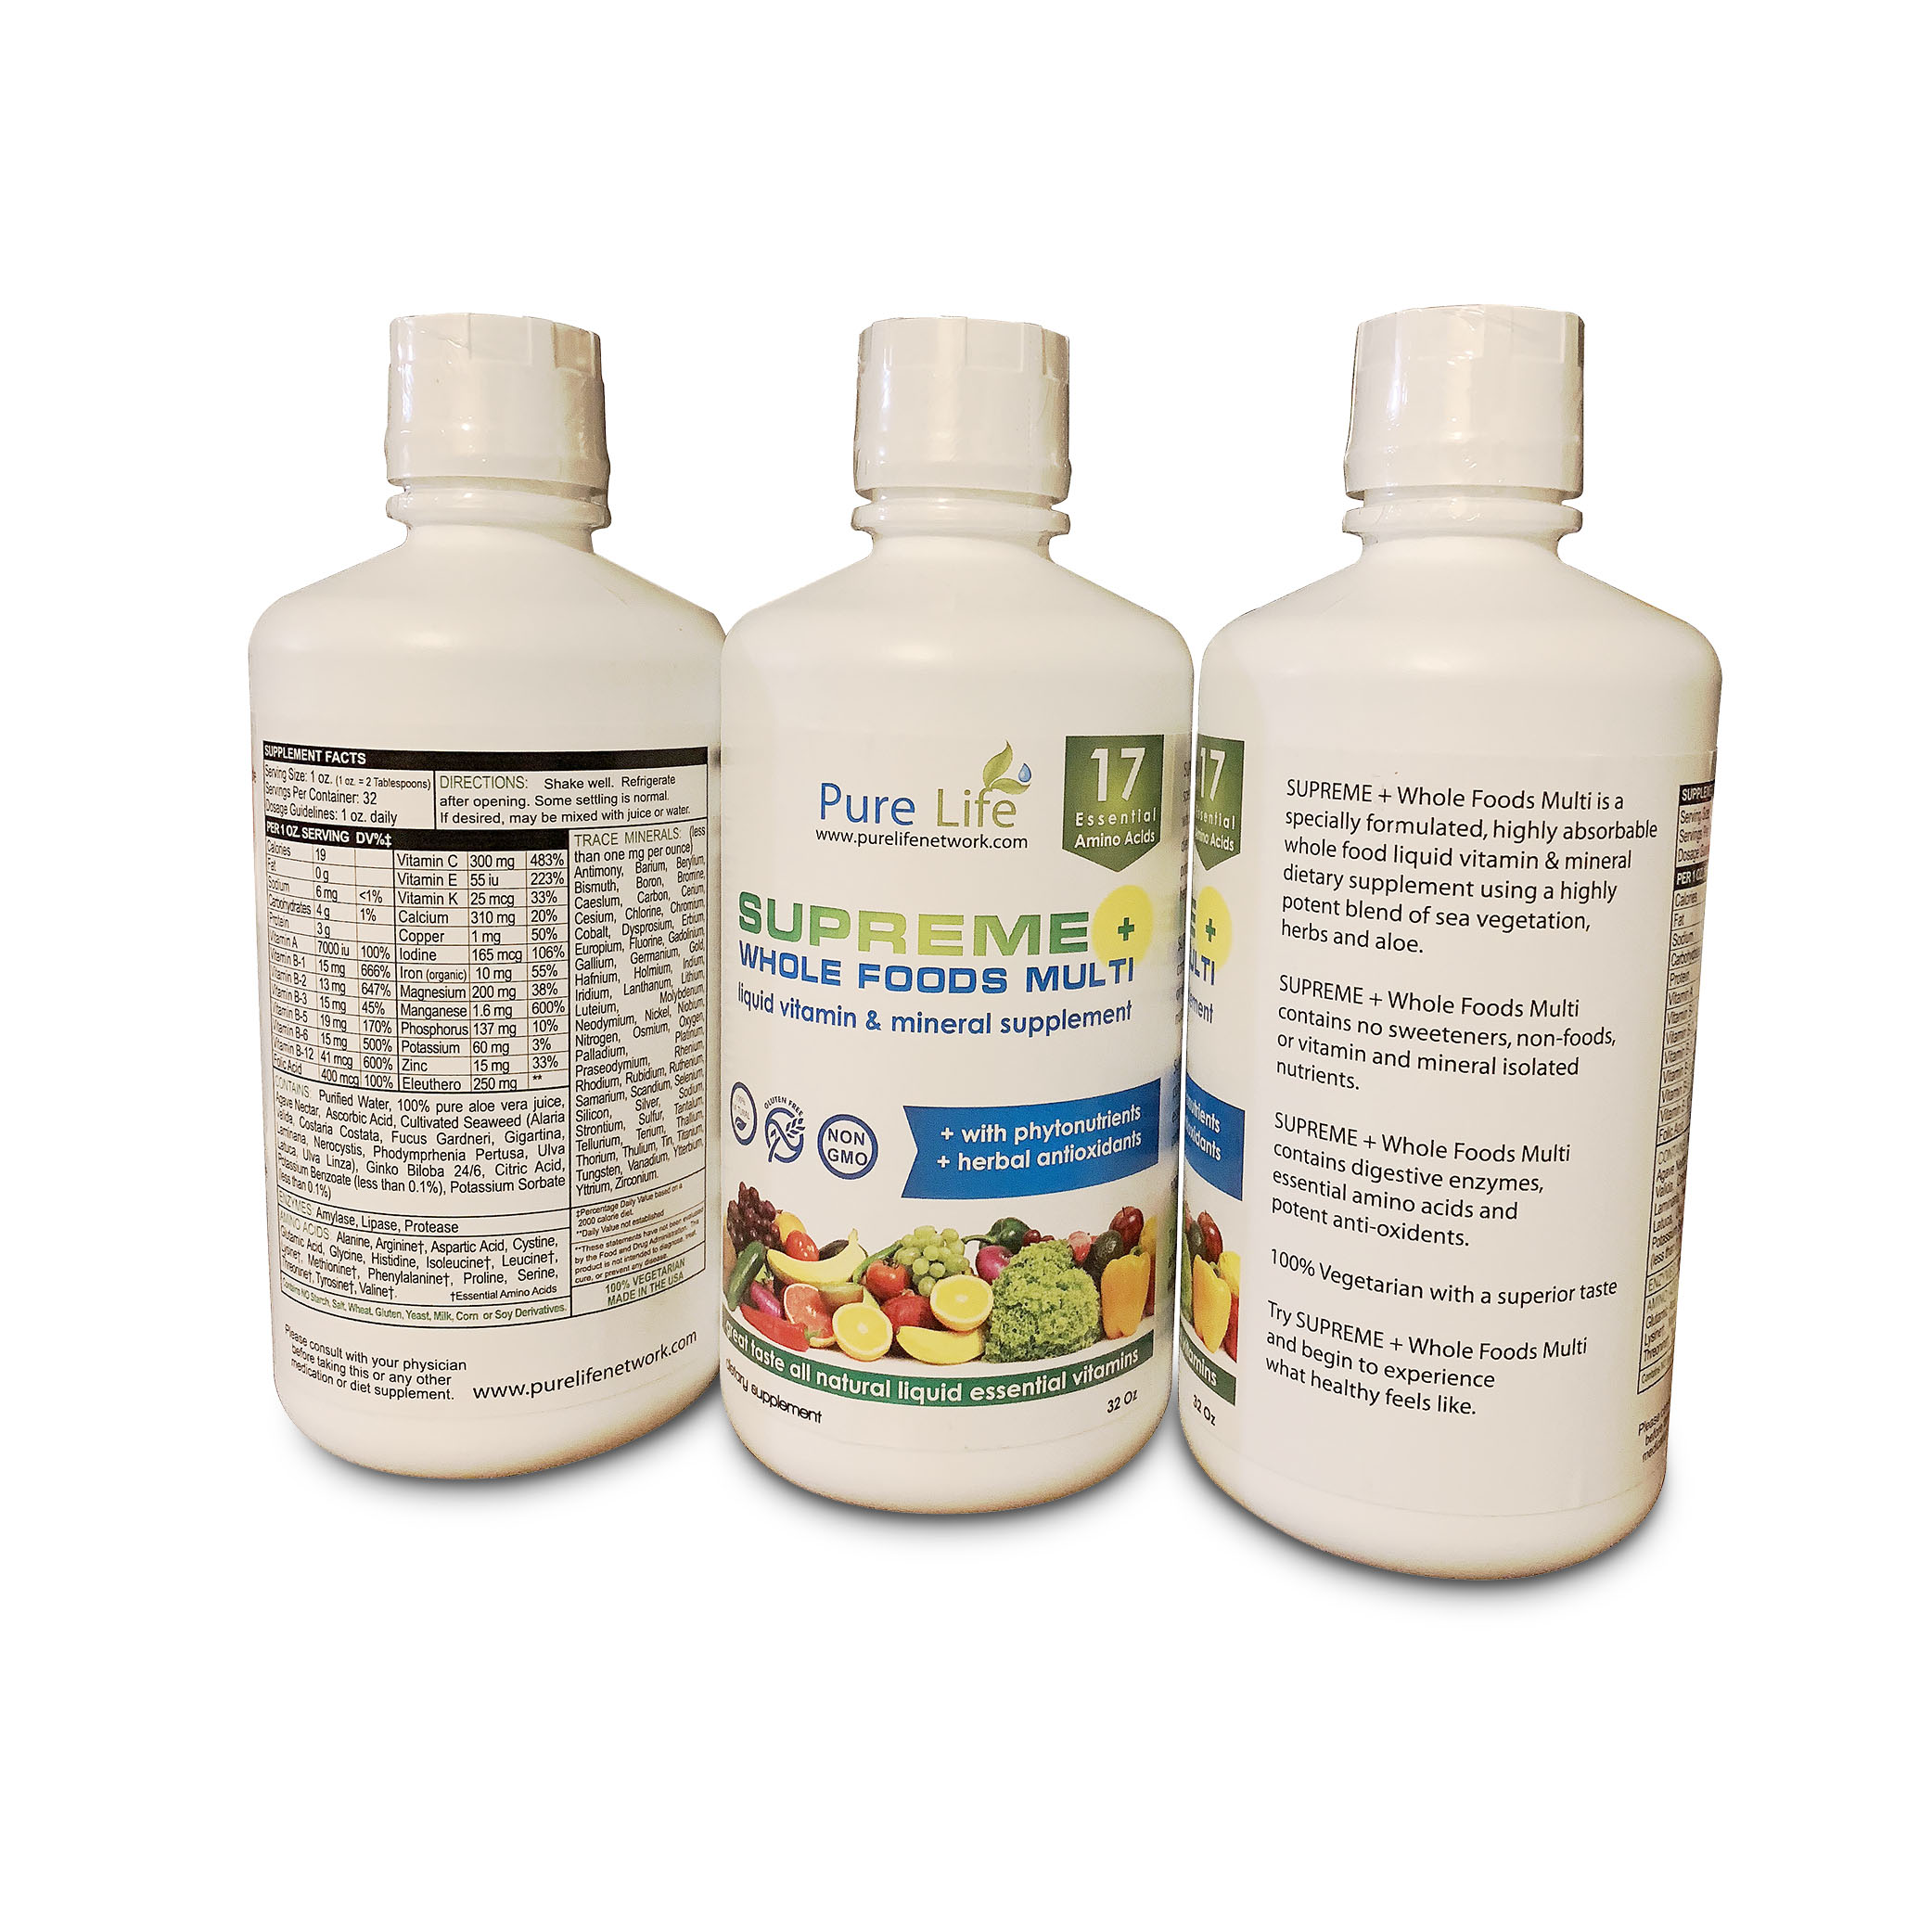 SUPREME+ Whole Foods Multi Liquid Vitamin and Mineral Supplement